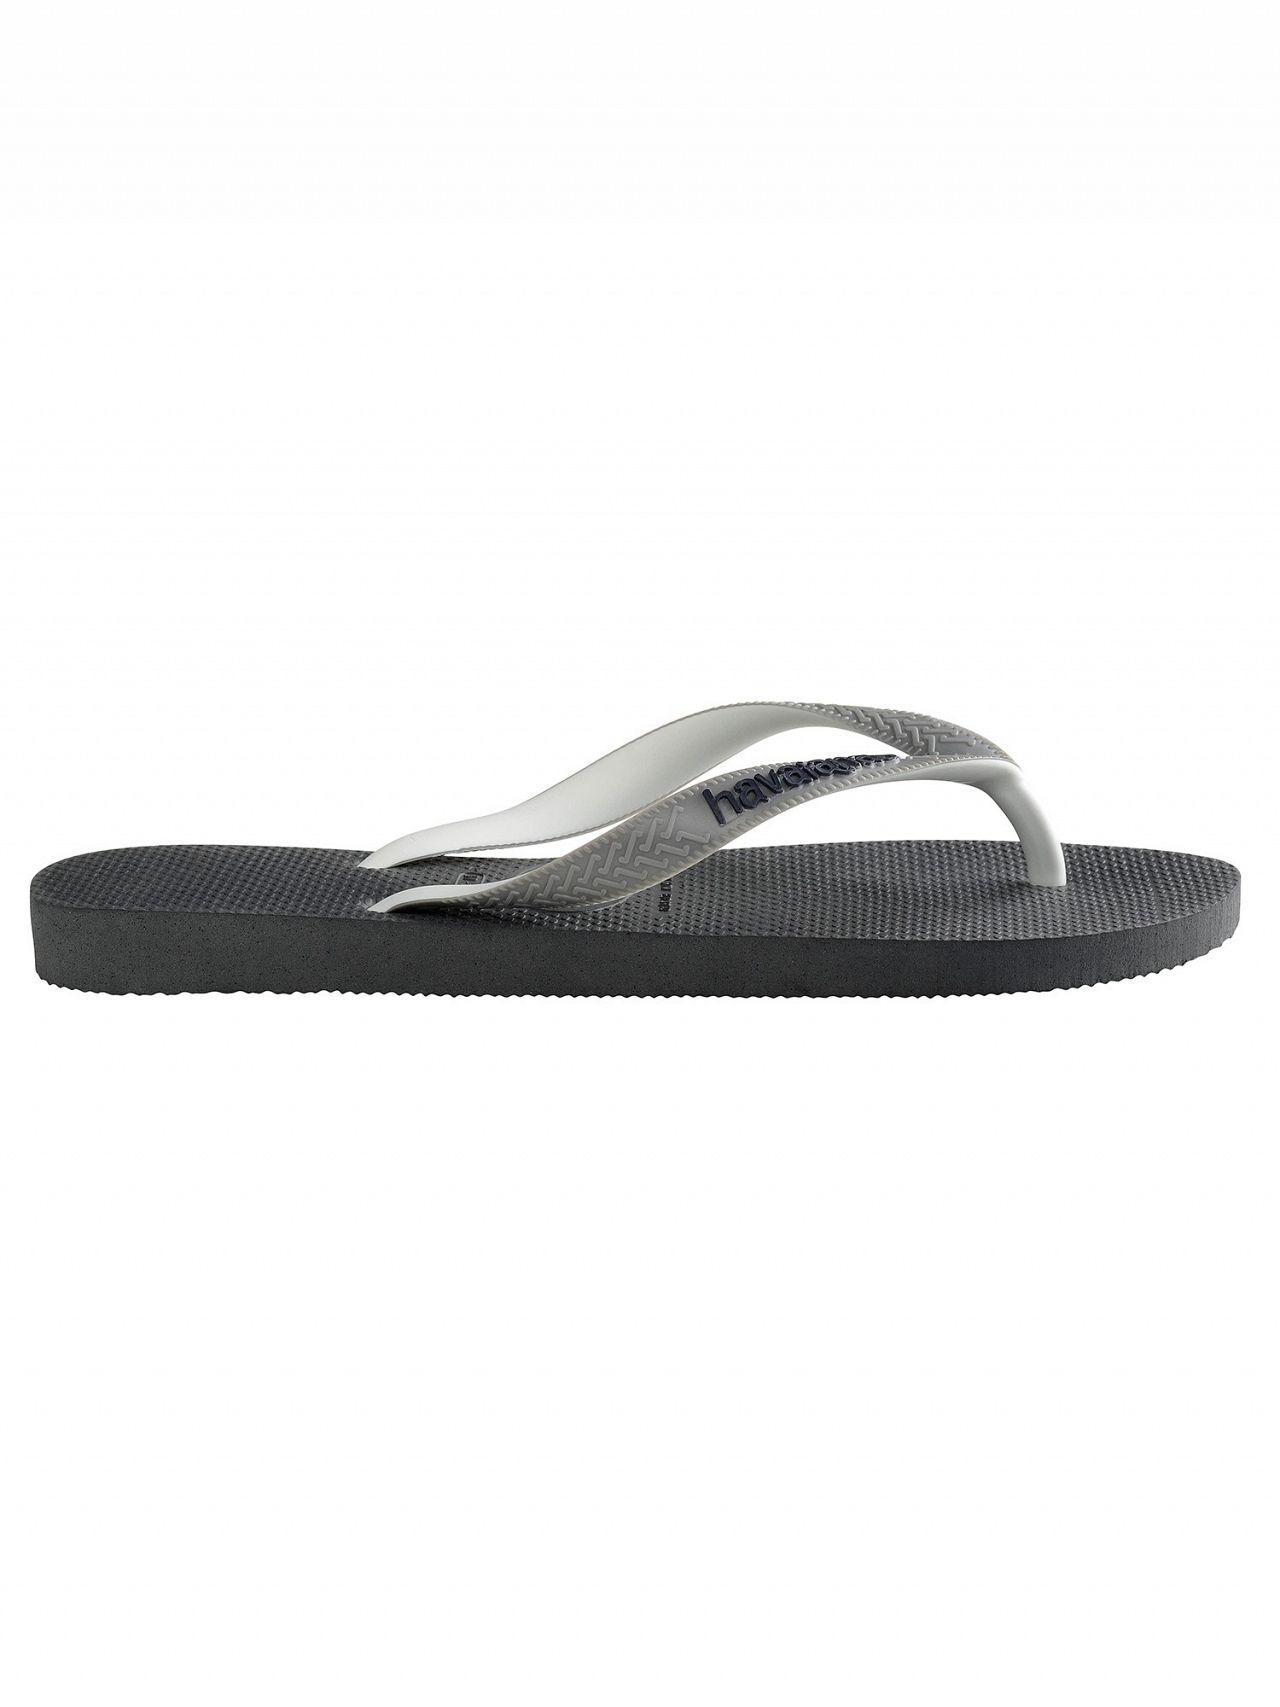 dff61212a6fa4 Havaianas - Gray Graphite Grey Top Mix Flip Flops for Men - Lyst. View  fullscreen